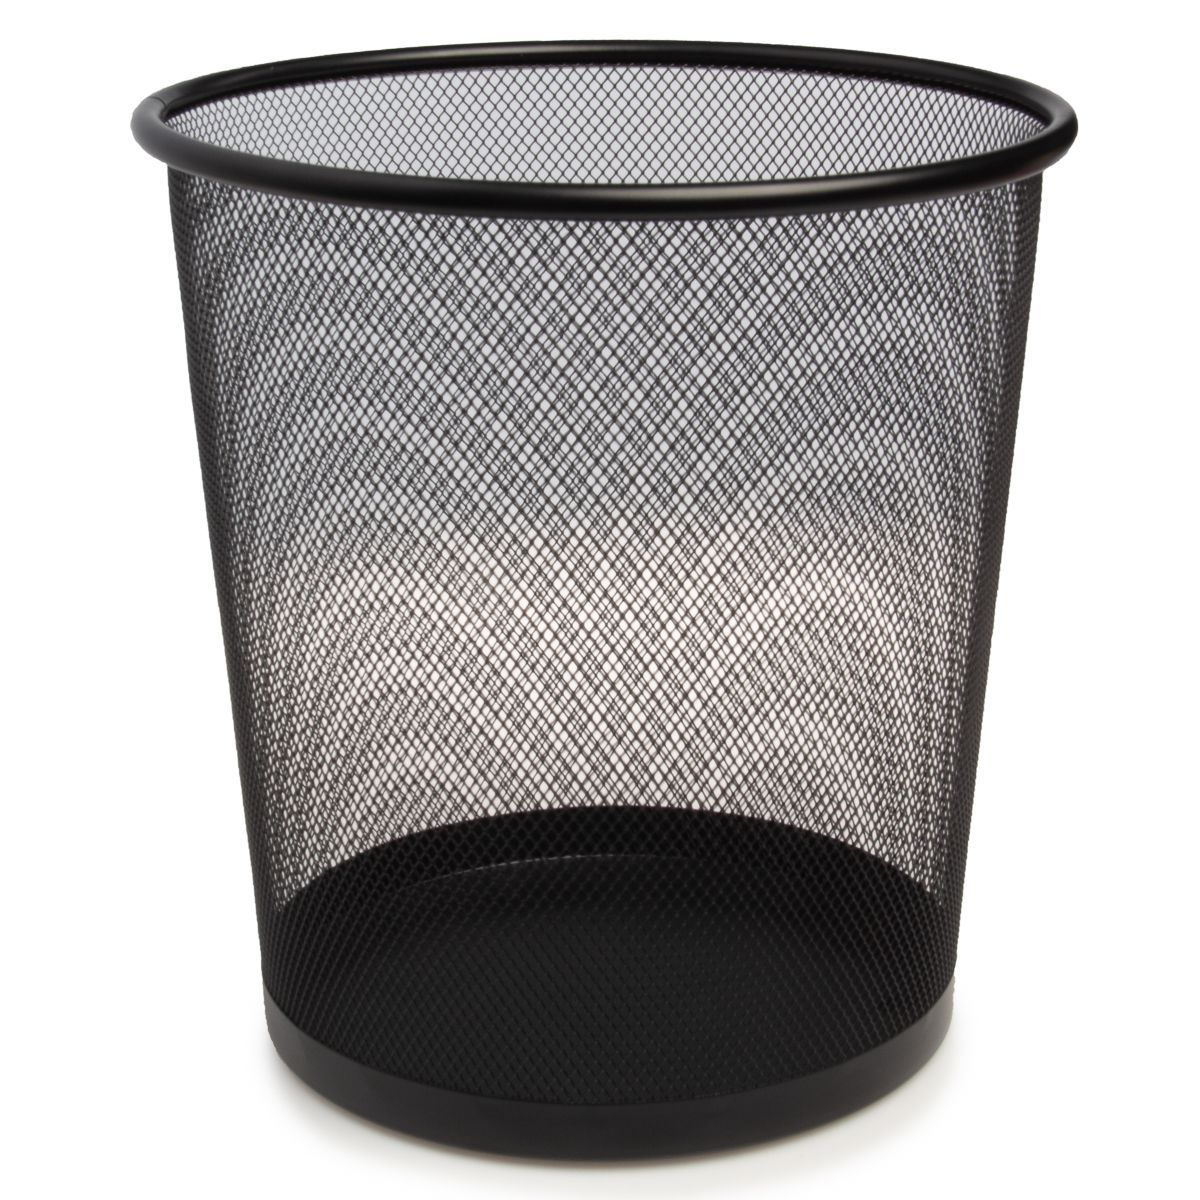 Simply Genius Metal Mesh Trash Can Wastebasket Home Office Bathroom Trash Can Bedroom Trash Can Trash Cans